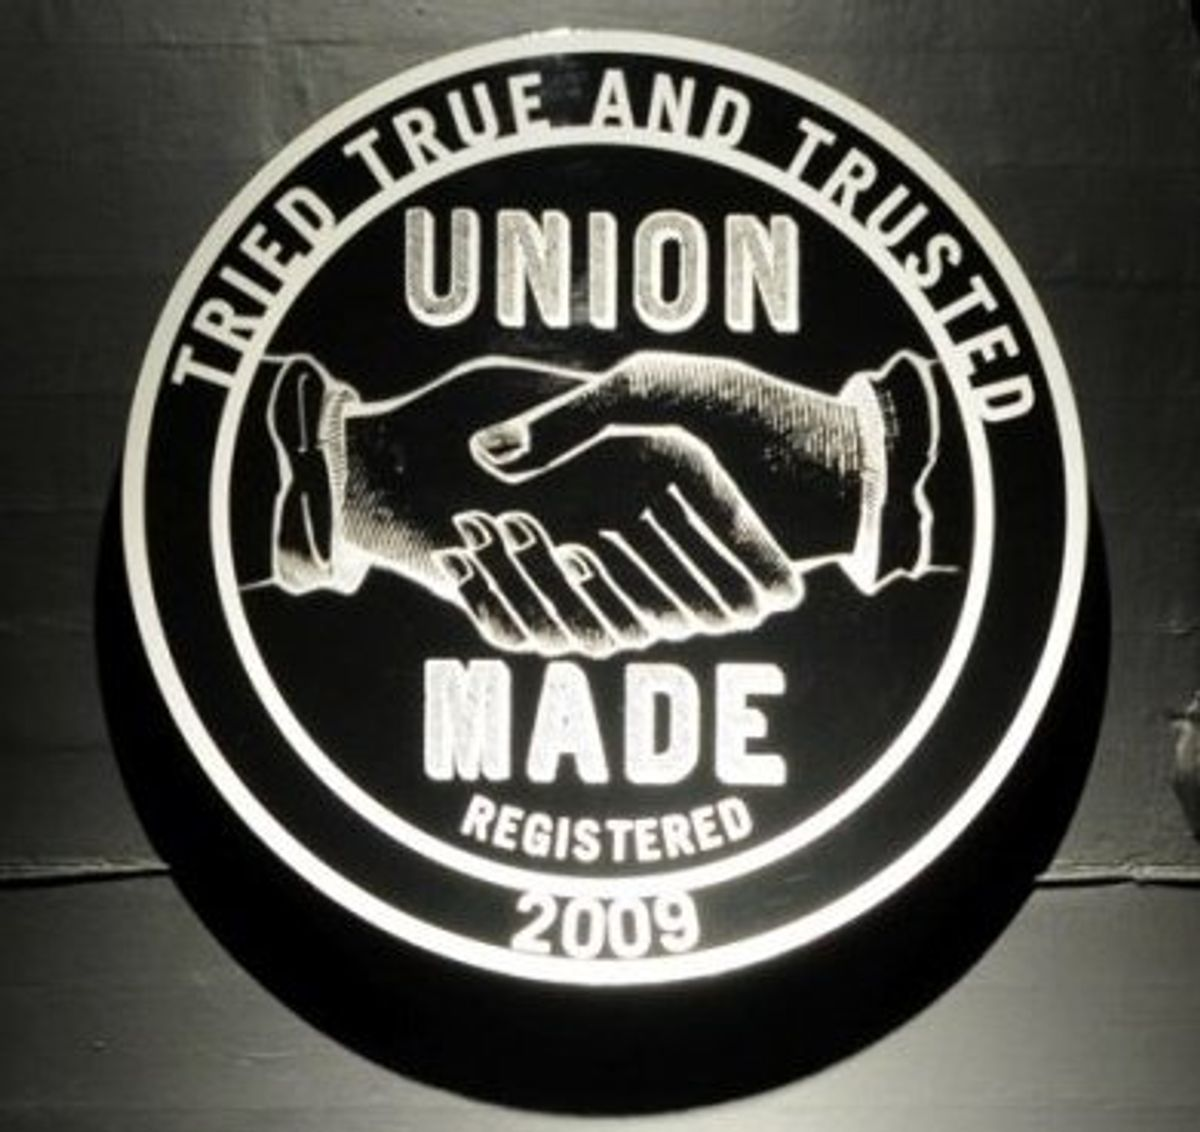 UnionMade's logo copies AFL-CIO's (via UnionMade's Facebook page)